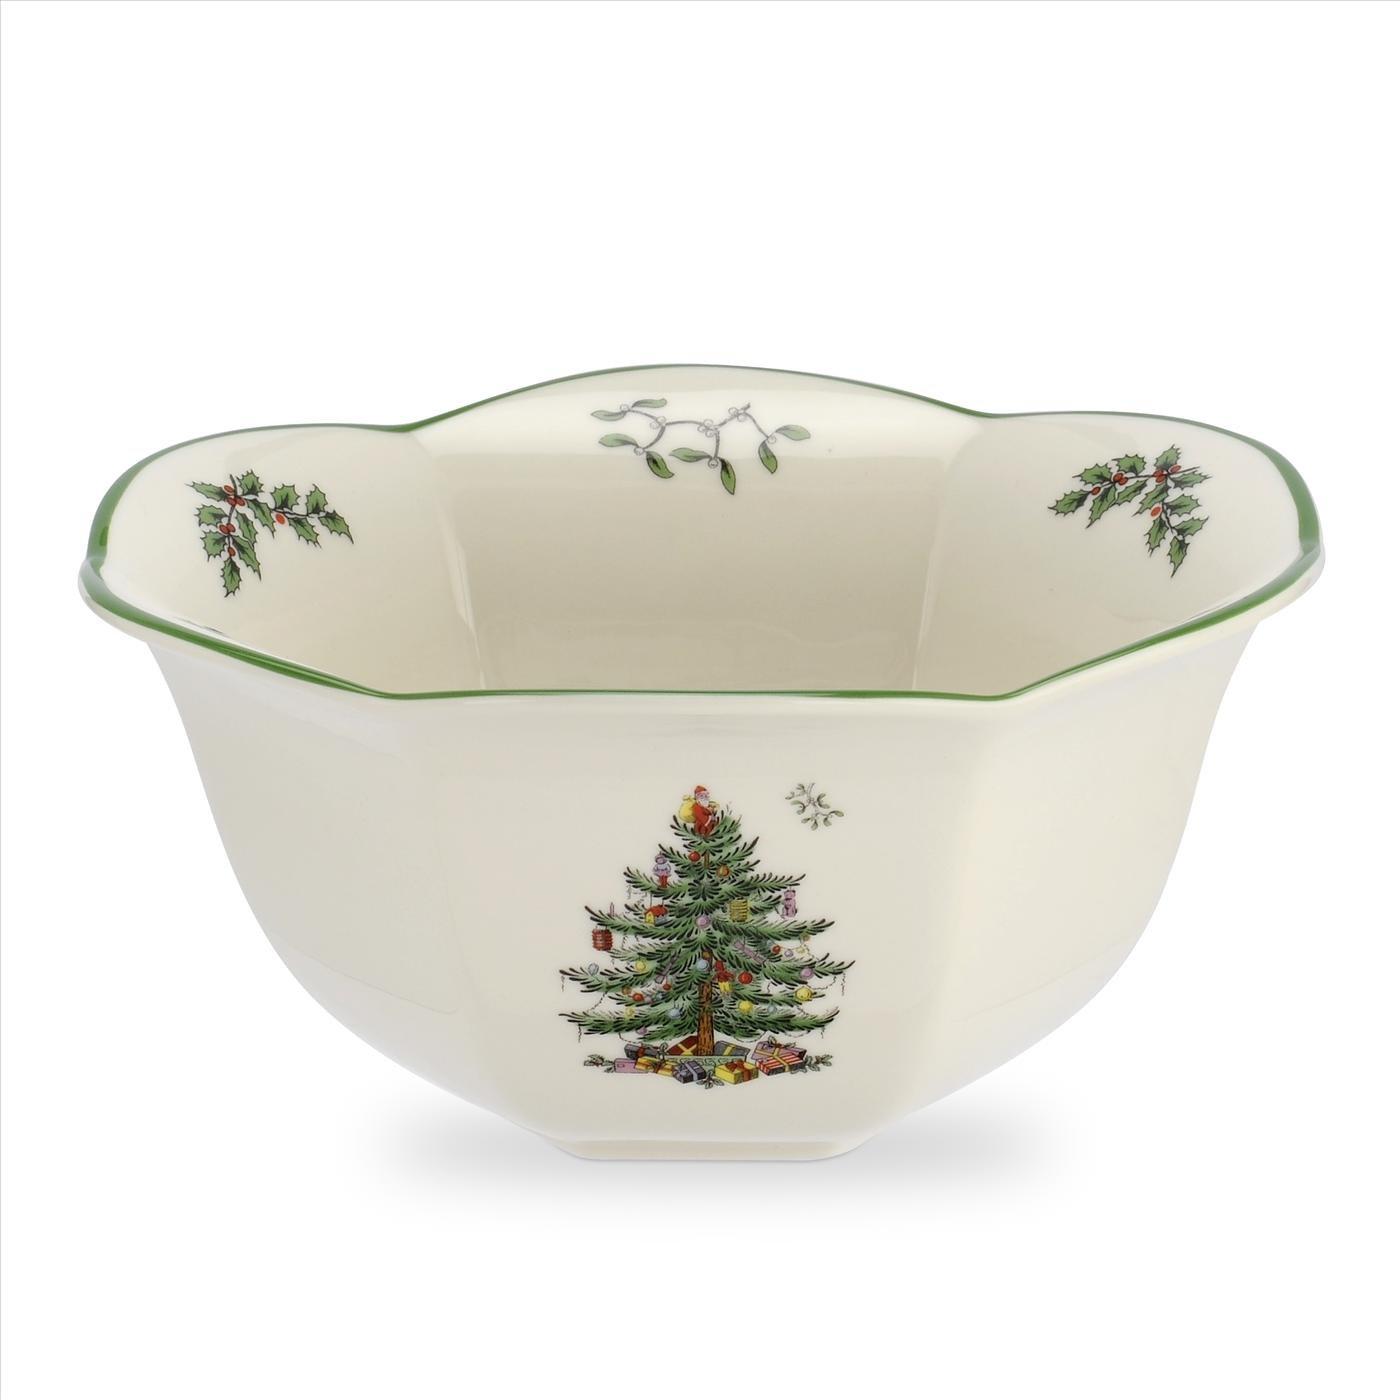 Spode Exclusive Christmas Tree Hexagonal Nut Bowl